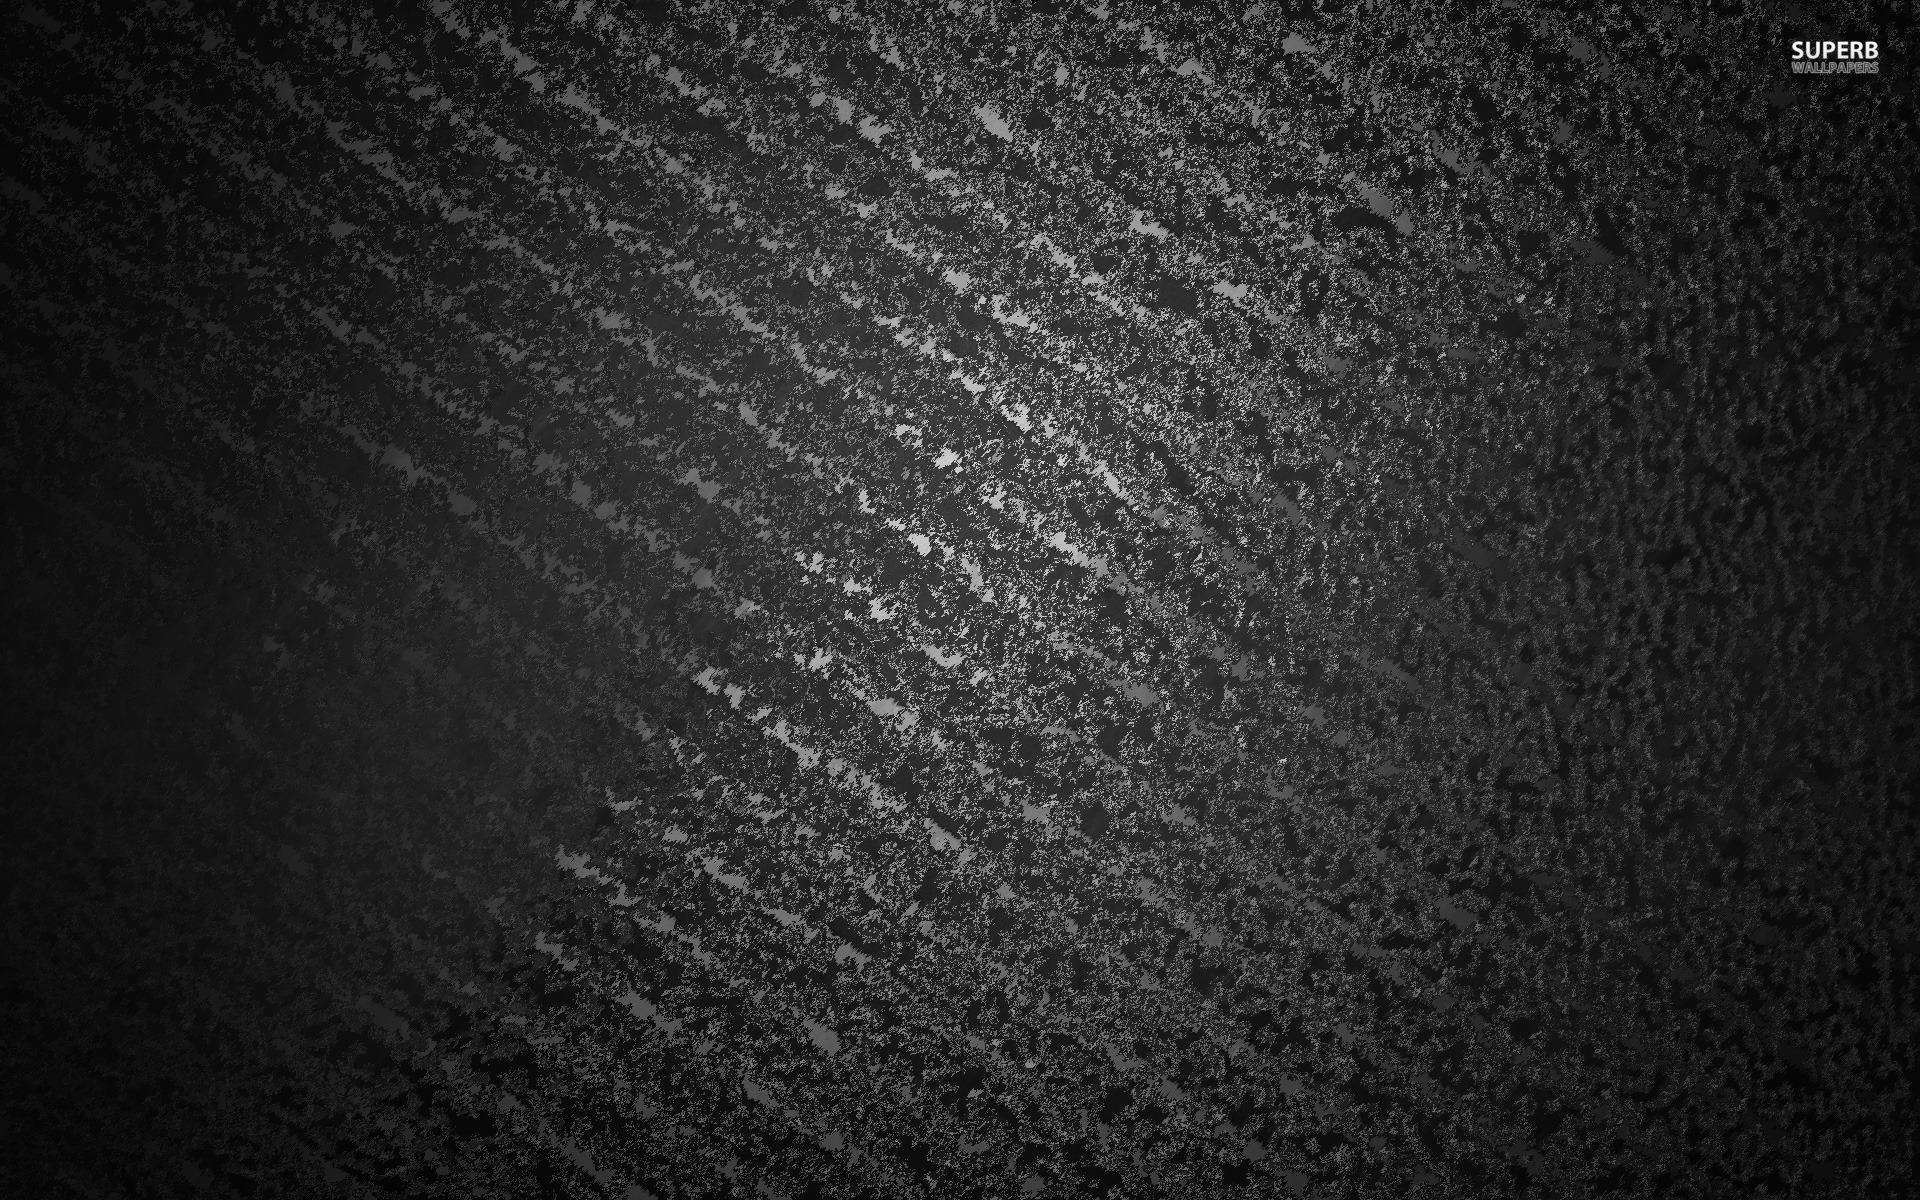 Black Texture Wallpaper Black Metallic Texture hd 1920x1200